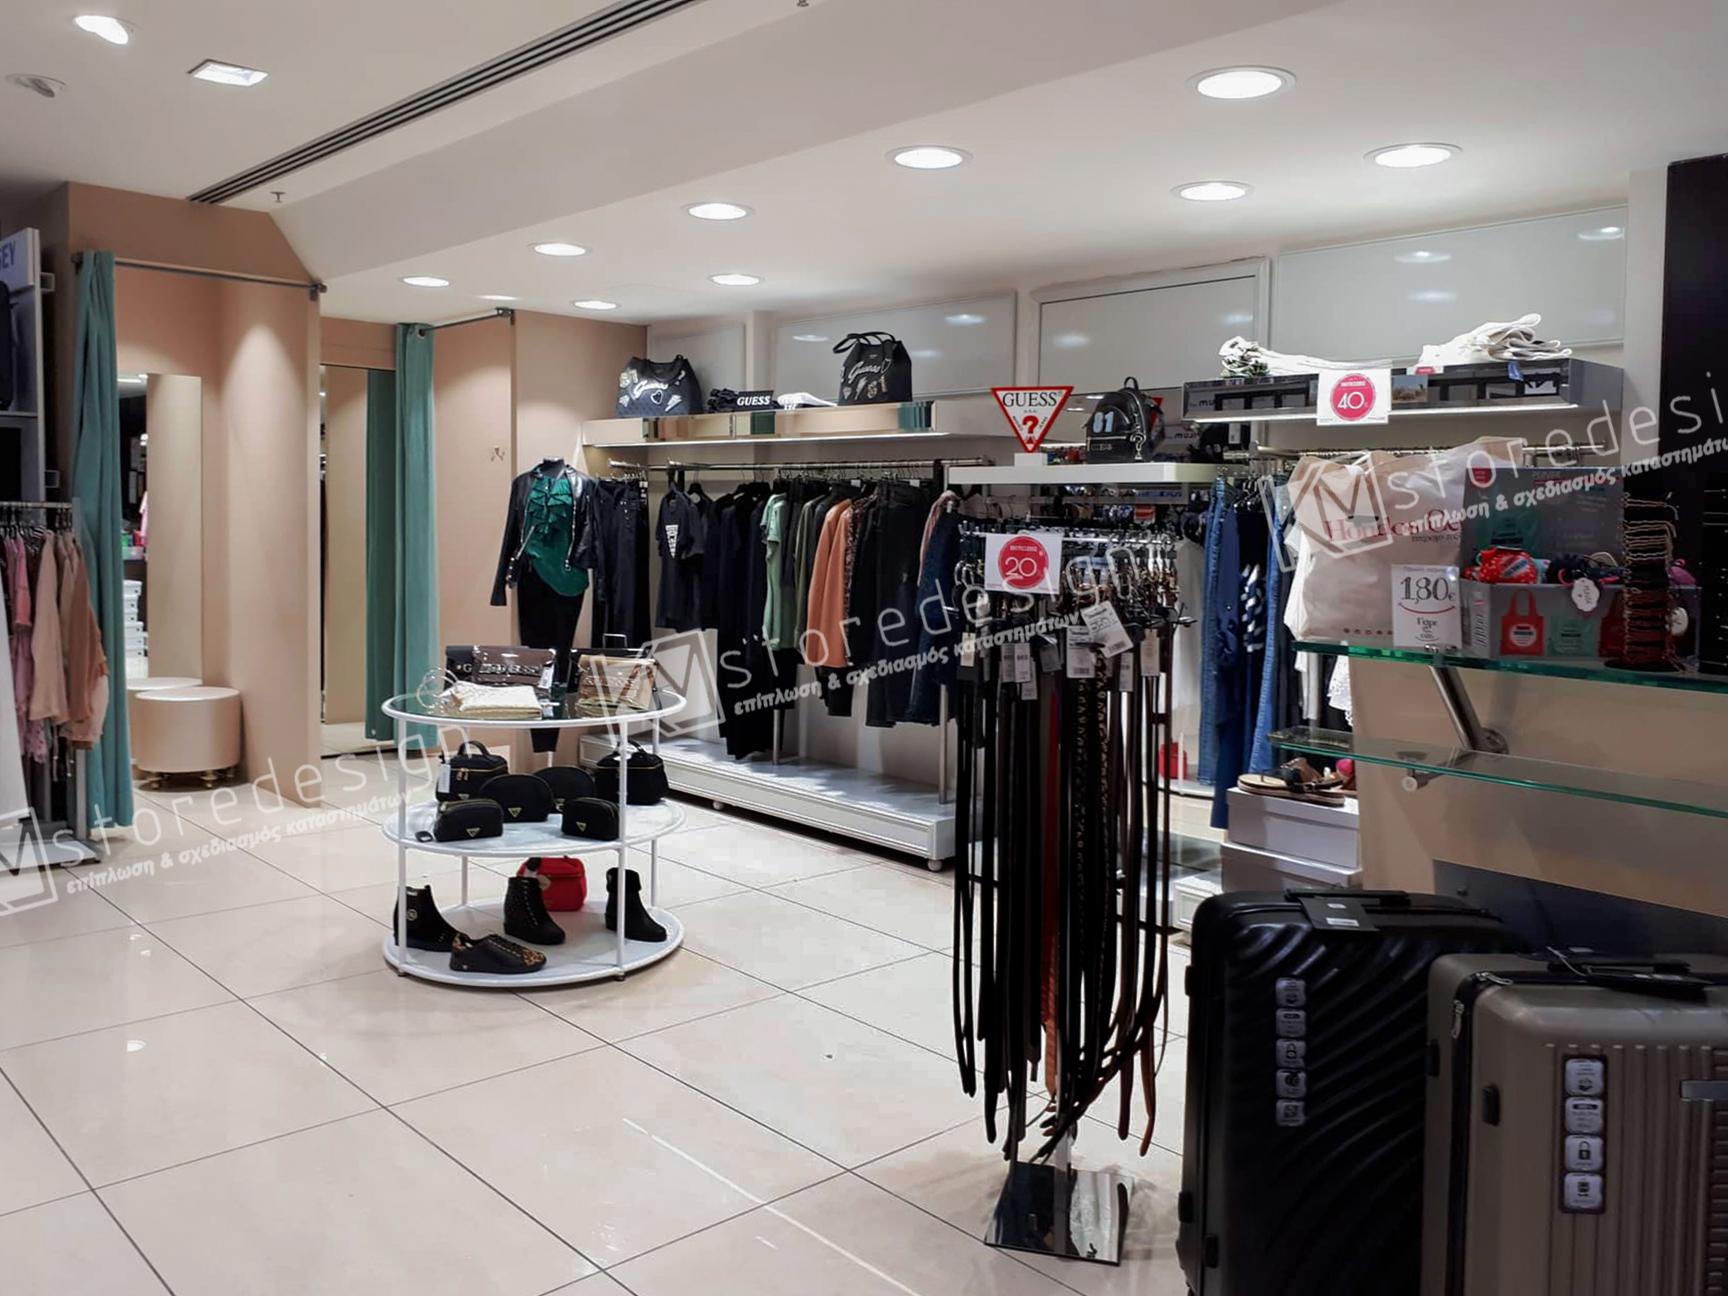 8b6b10727f Κατασκευές για ρούχα Hondos Center Αιγάλεω - Επιπλώσεις καταστημάτων ...